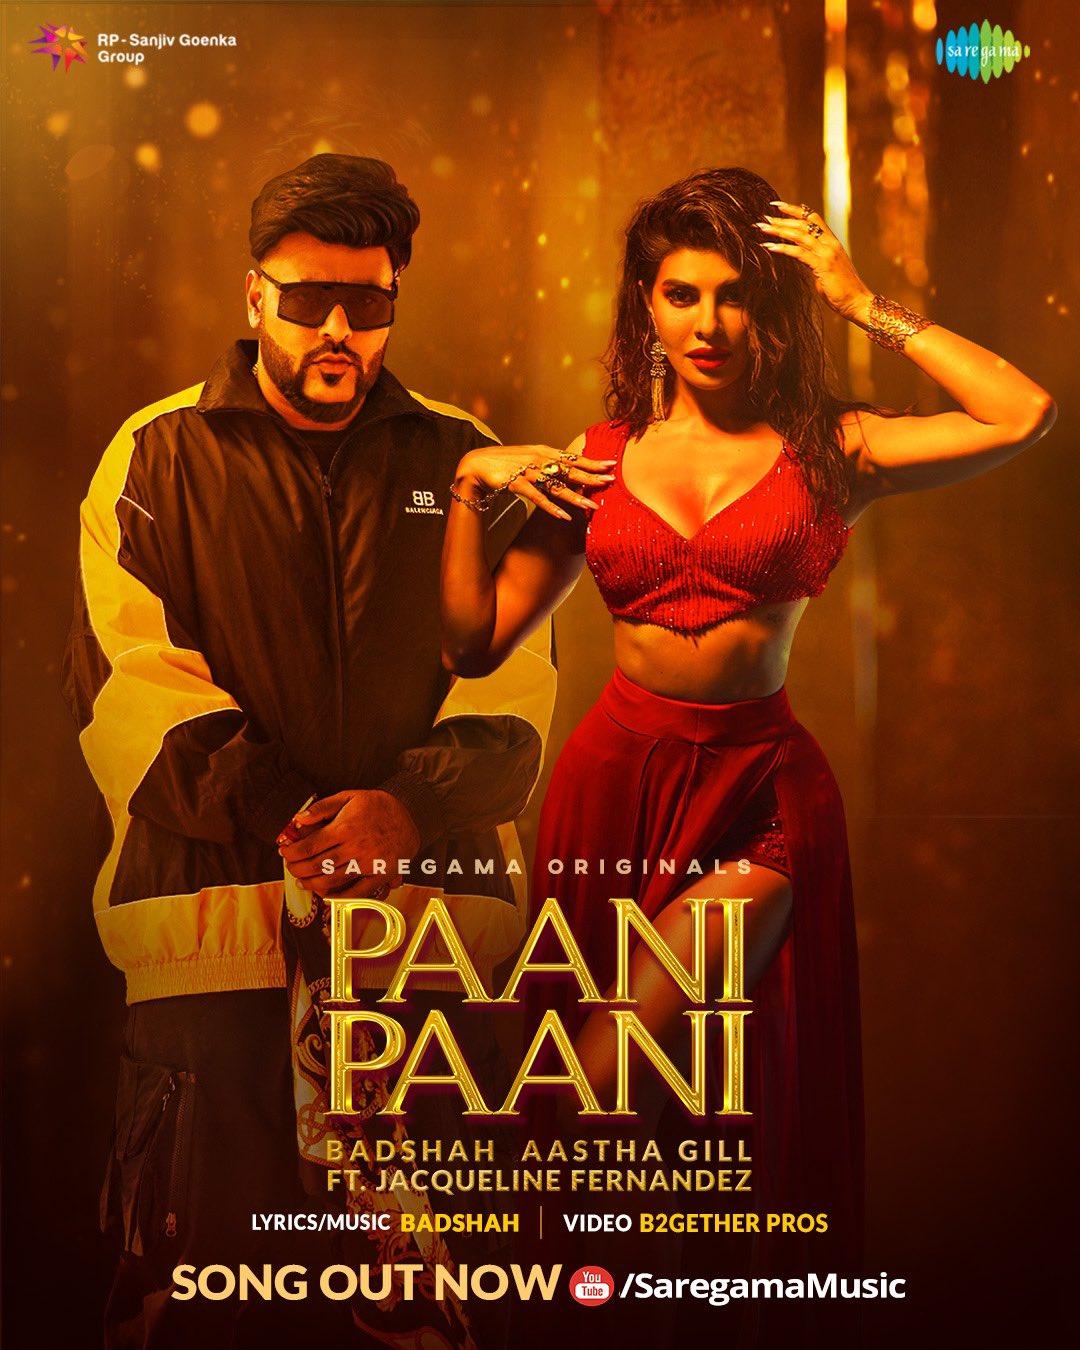 Paani Paani By Badshah Official Music Video 1080p HDRip 72MB Download